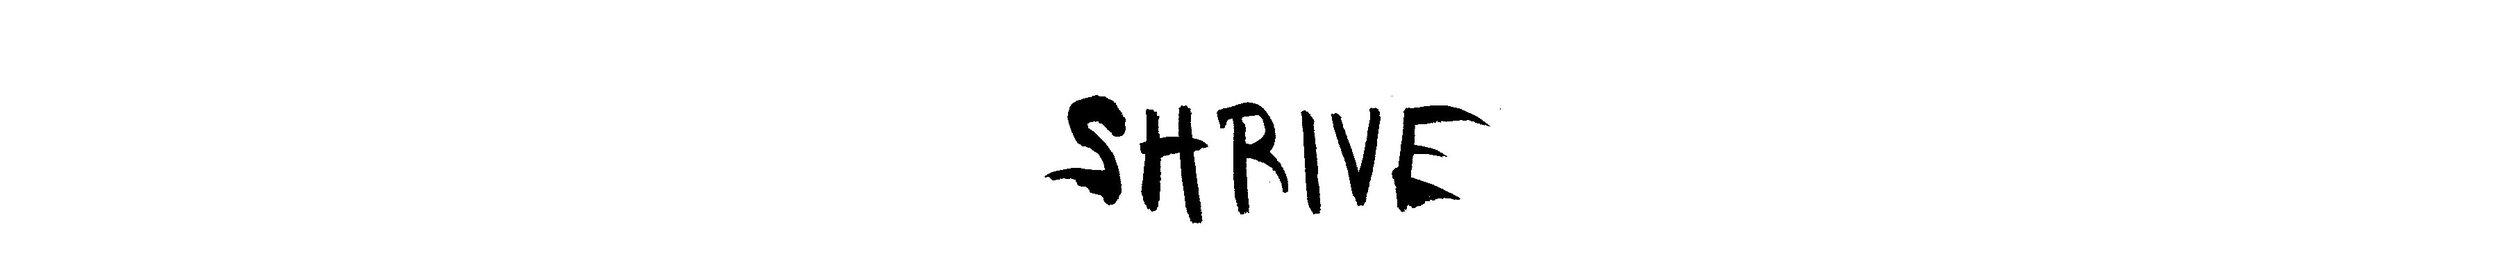 Shrive Title 2 copy.jpg